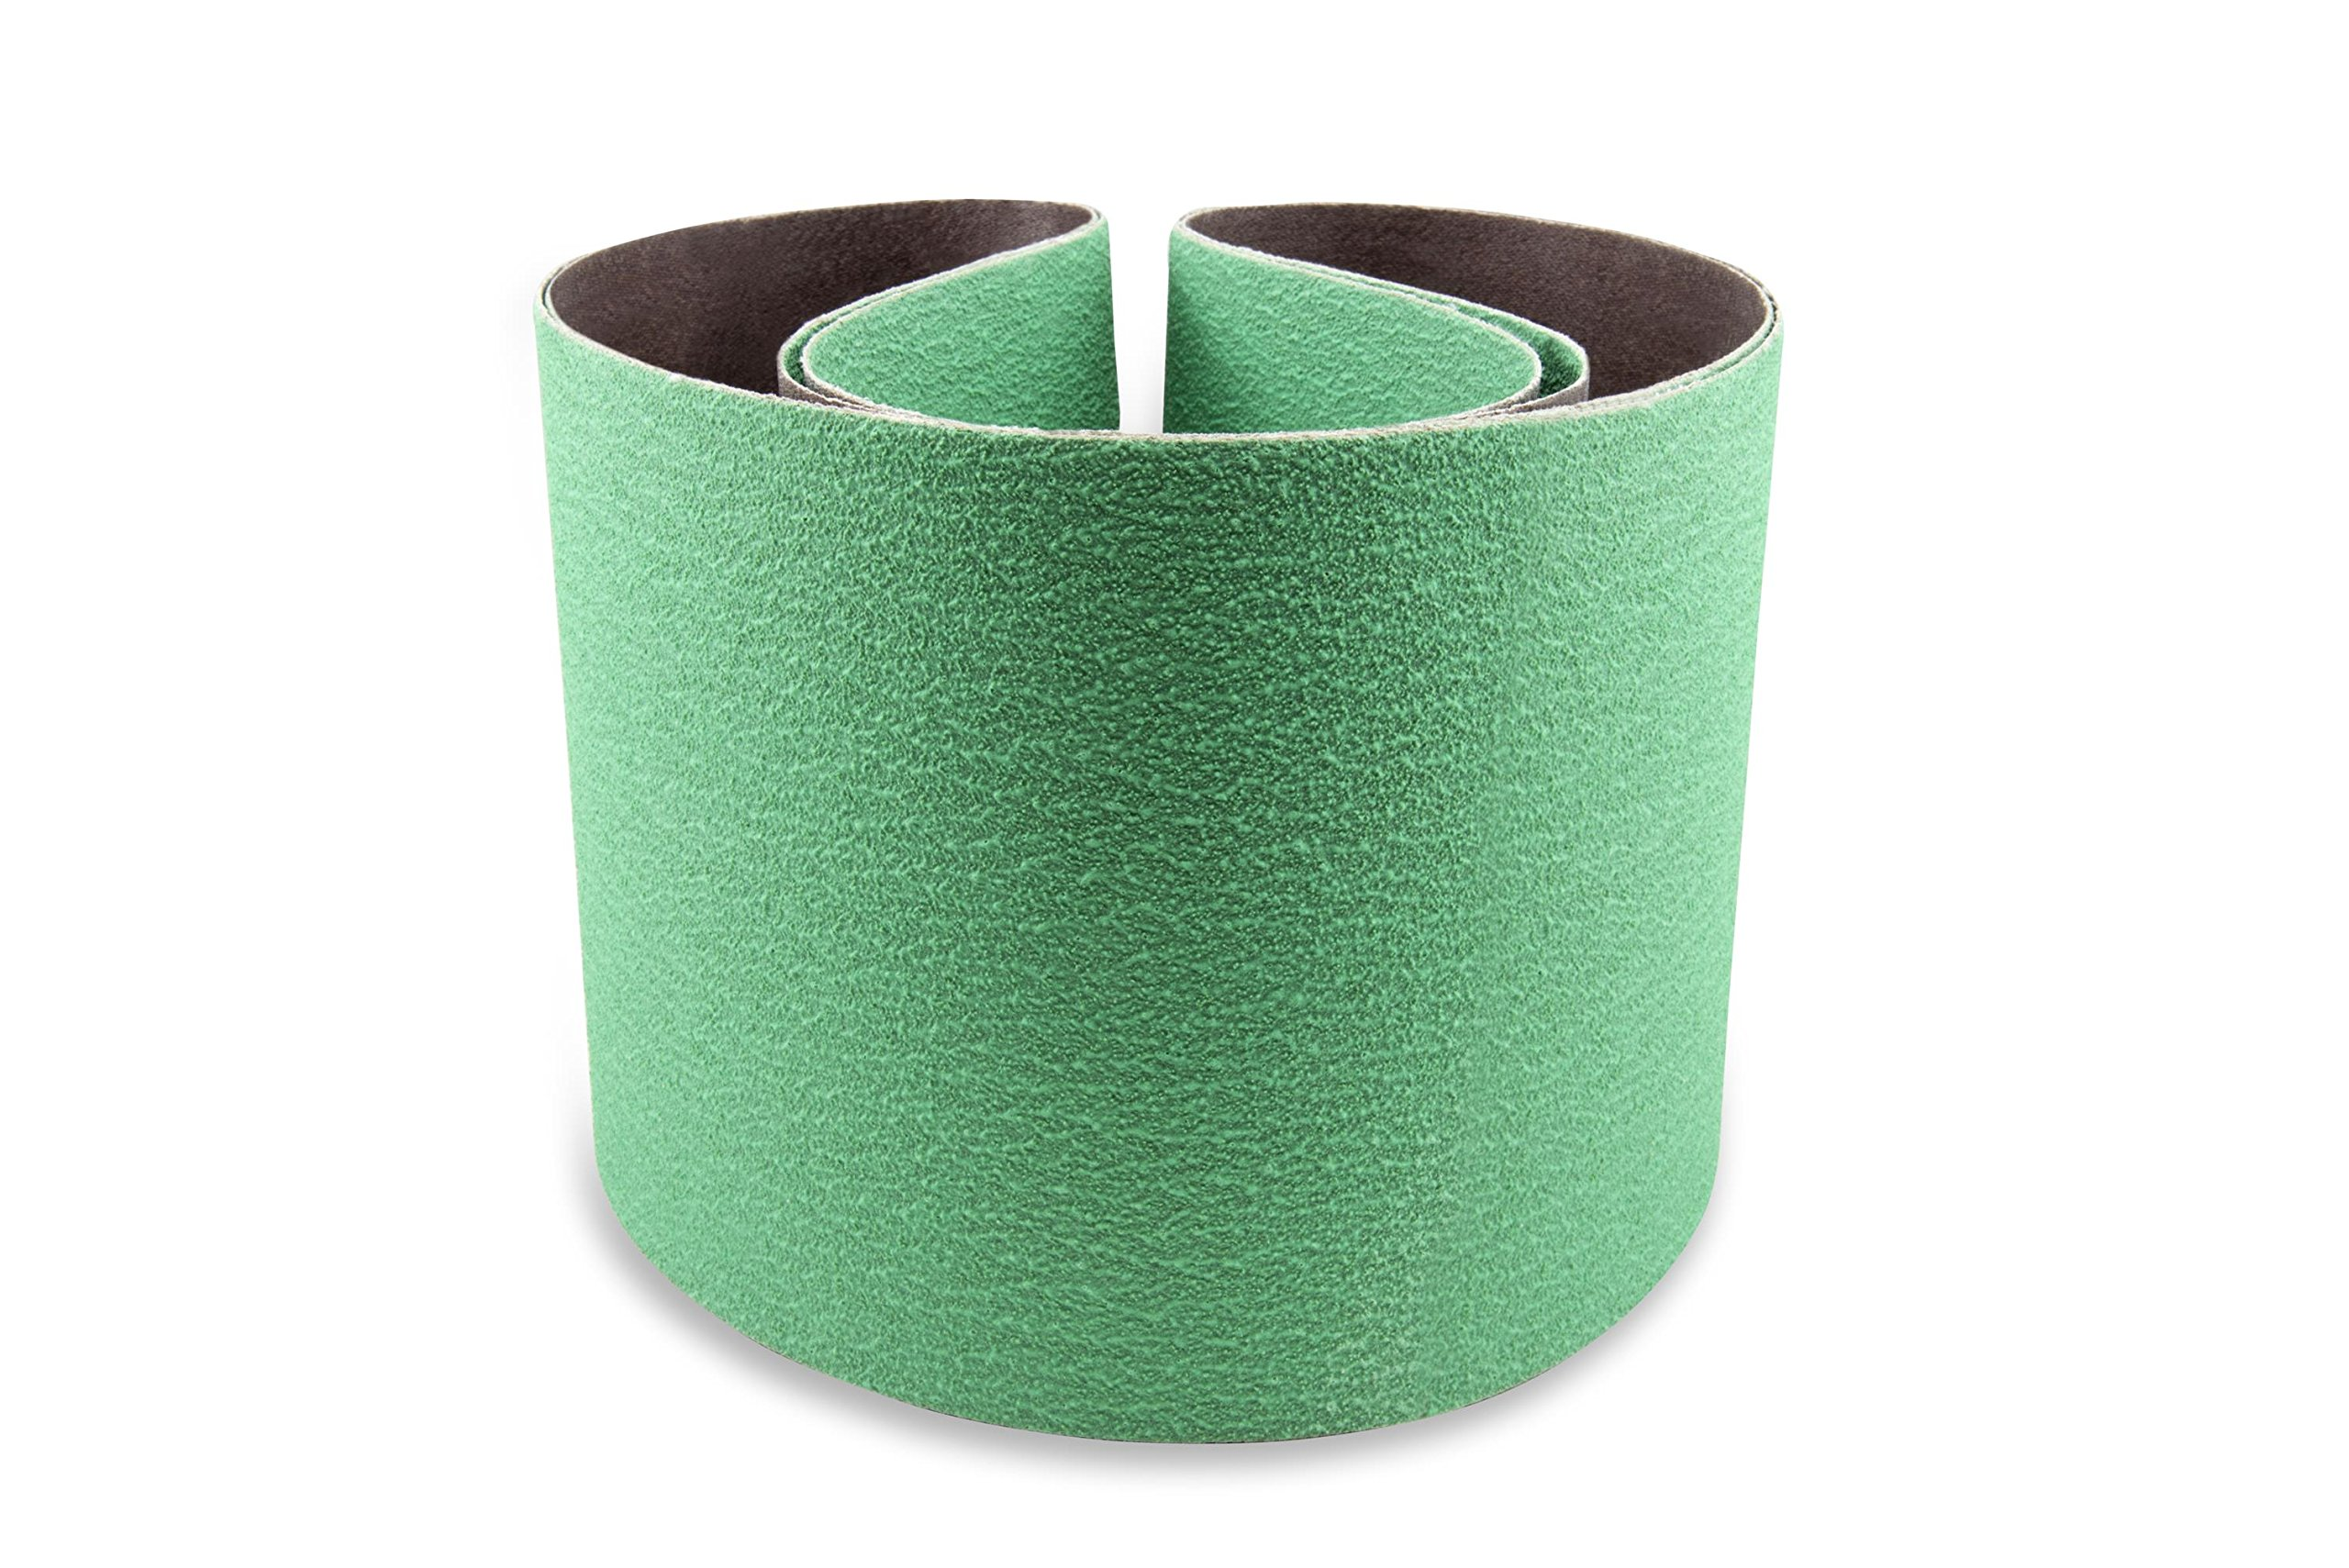 6 X 48 Inch 80 Grit Metal Grinding Ceramic Sanding Belts, Extra Long Life, 2 Pack